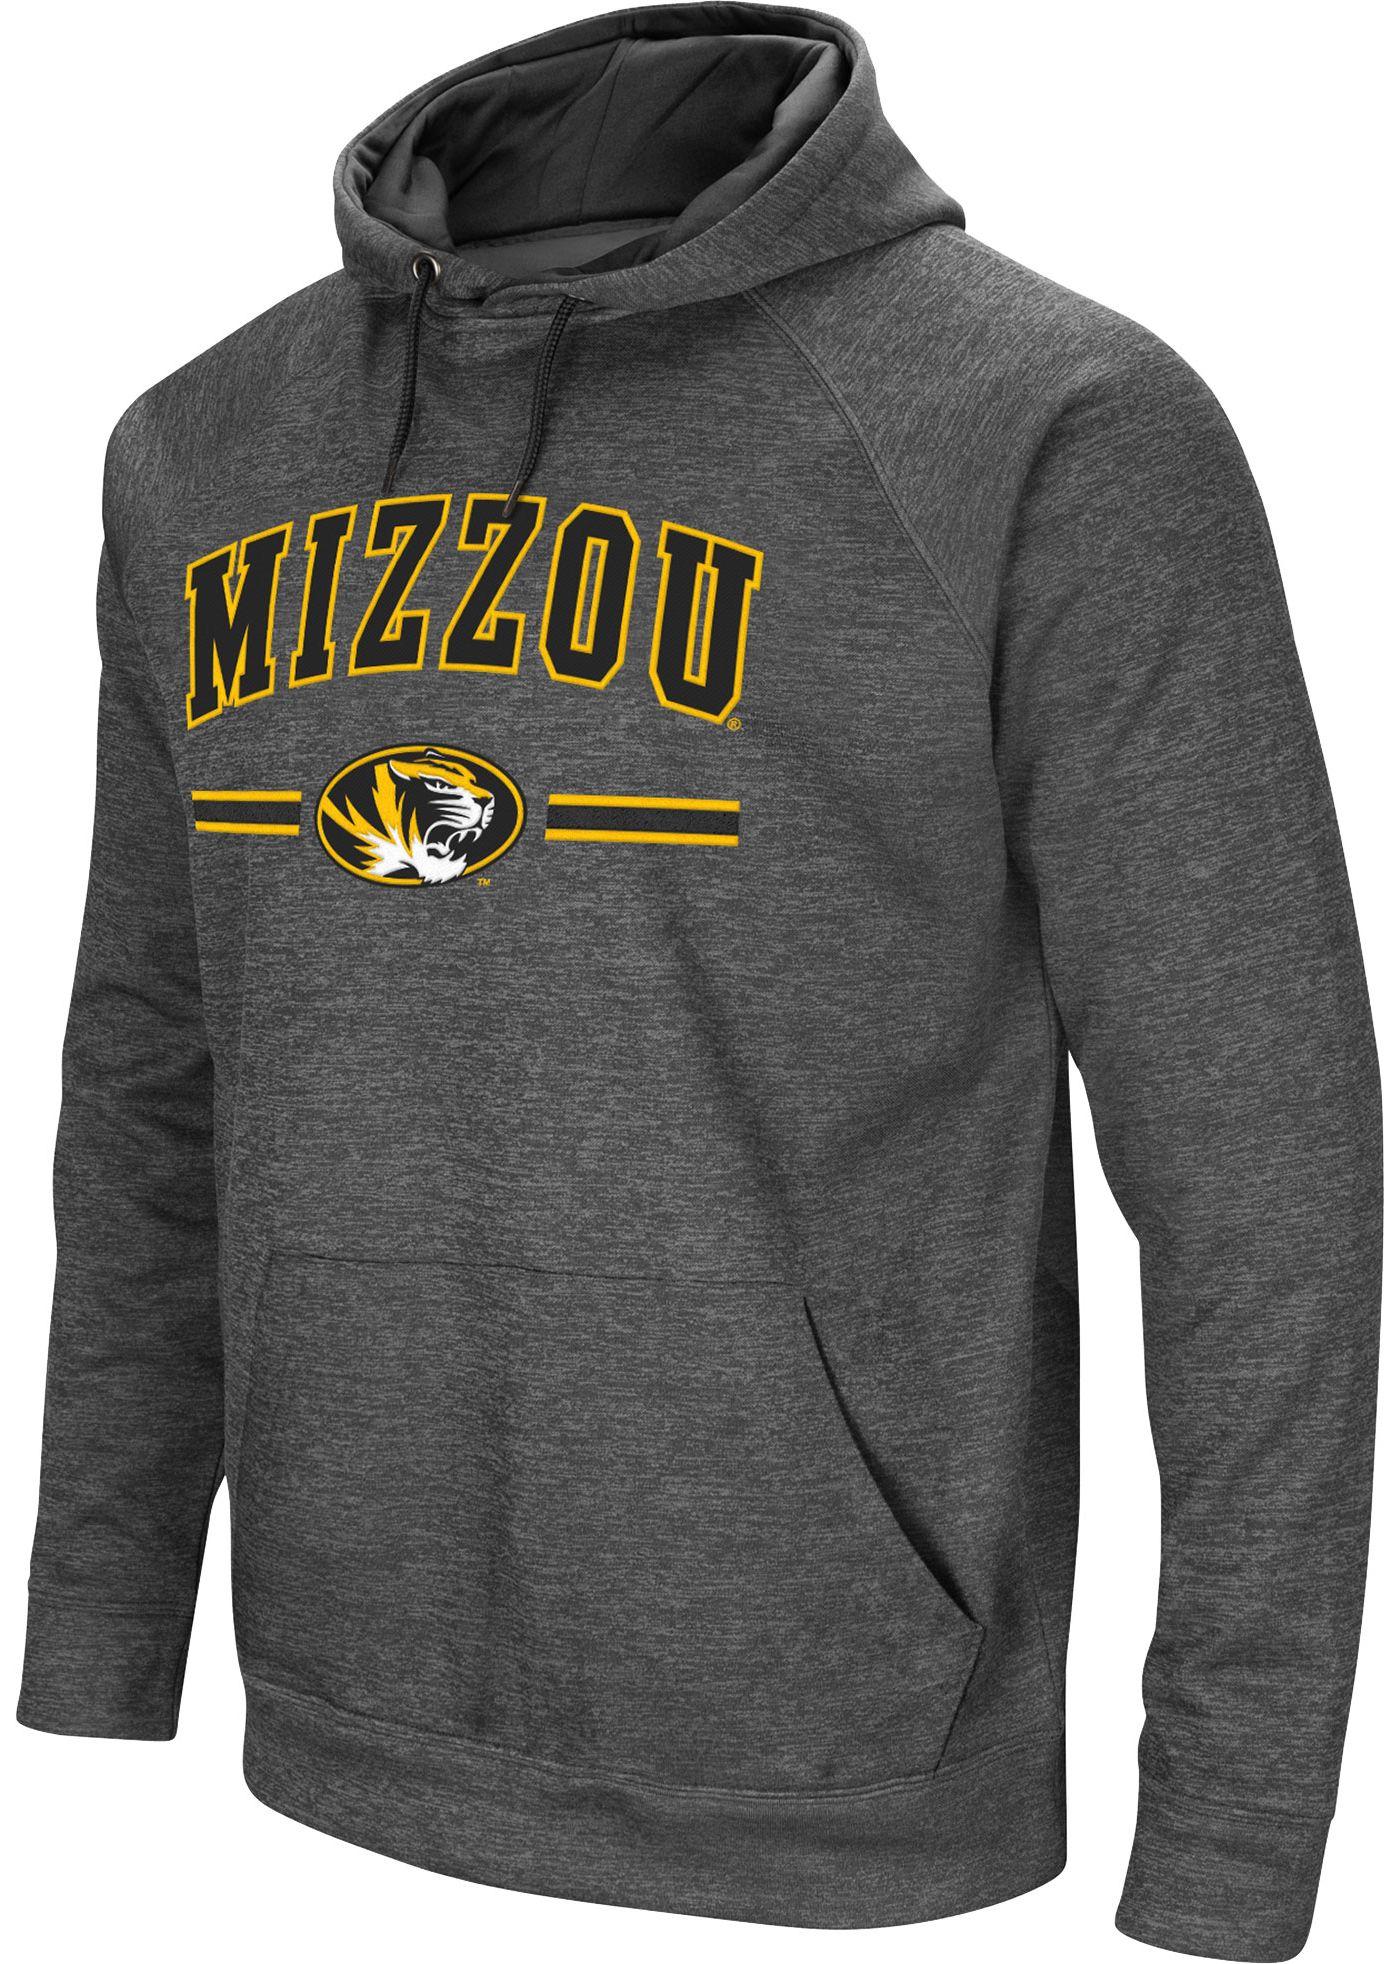 Colosseum Men's Missouri Tigers Grey Pullover Hoodie